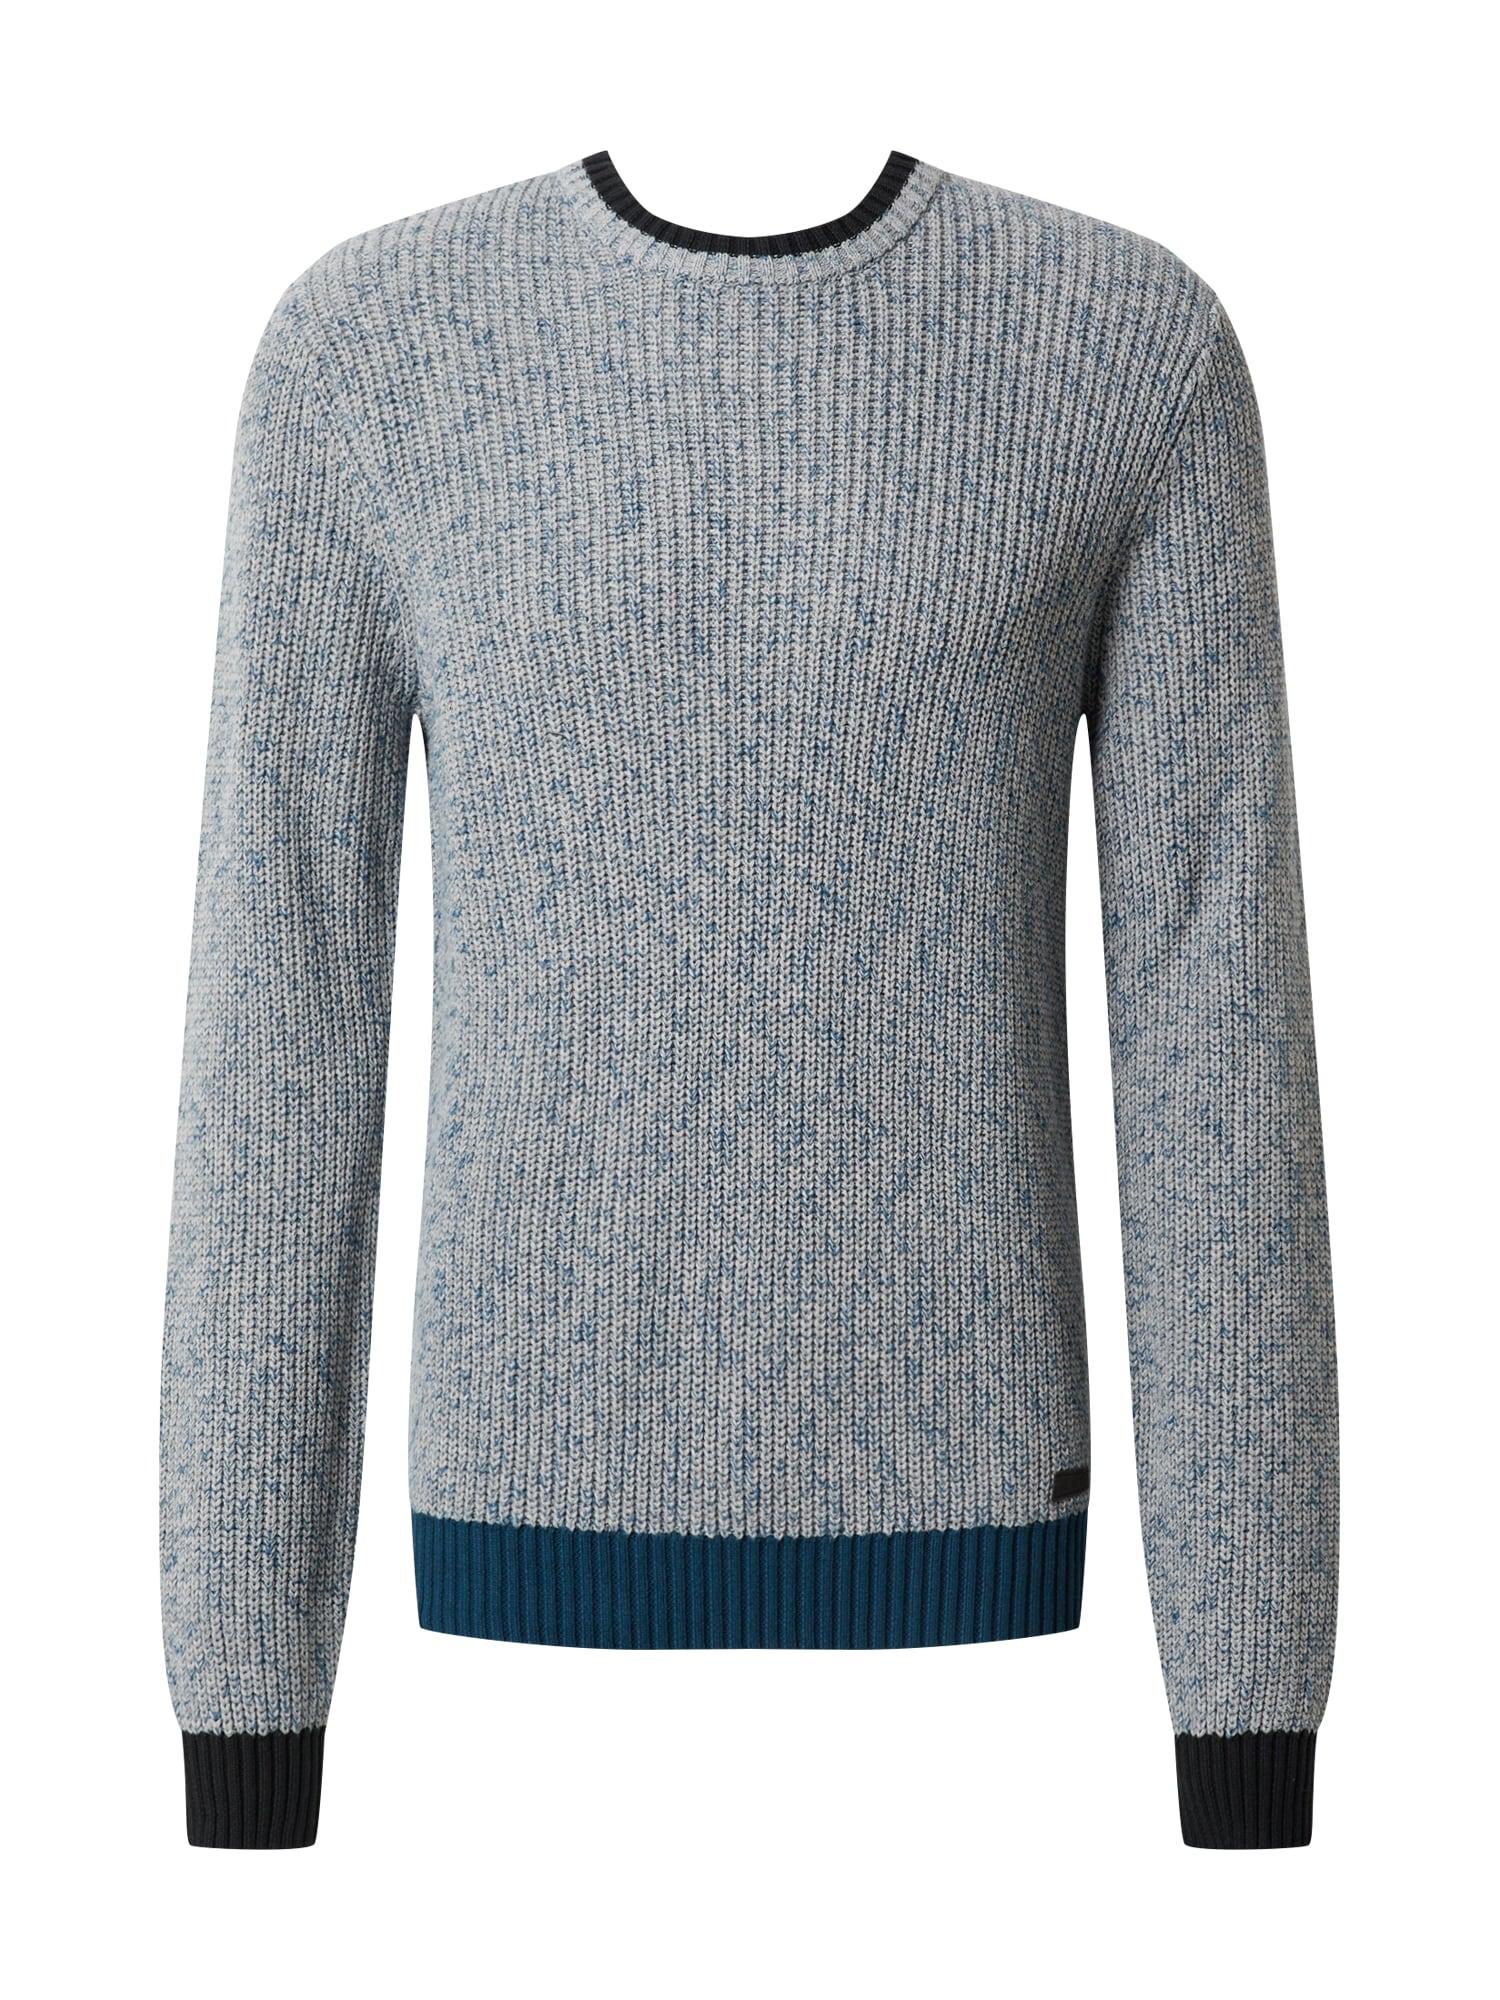 BLEND Megztinis pilka / benzino spalva / juoda